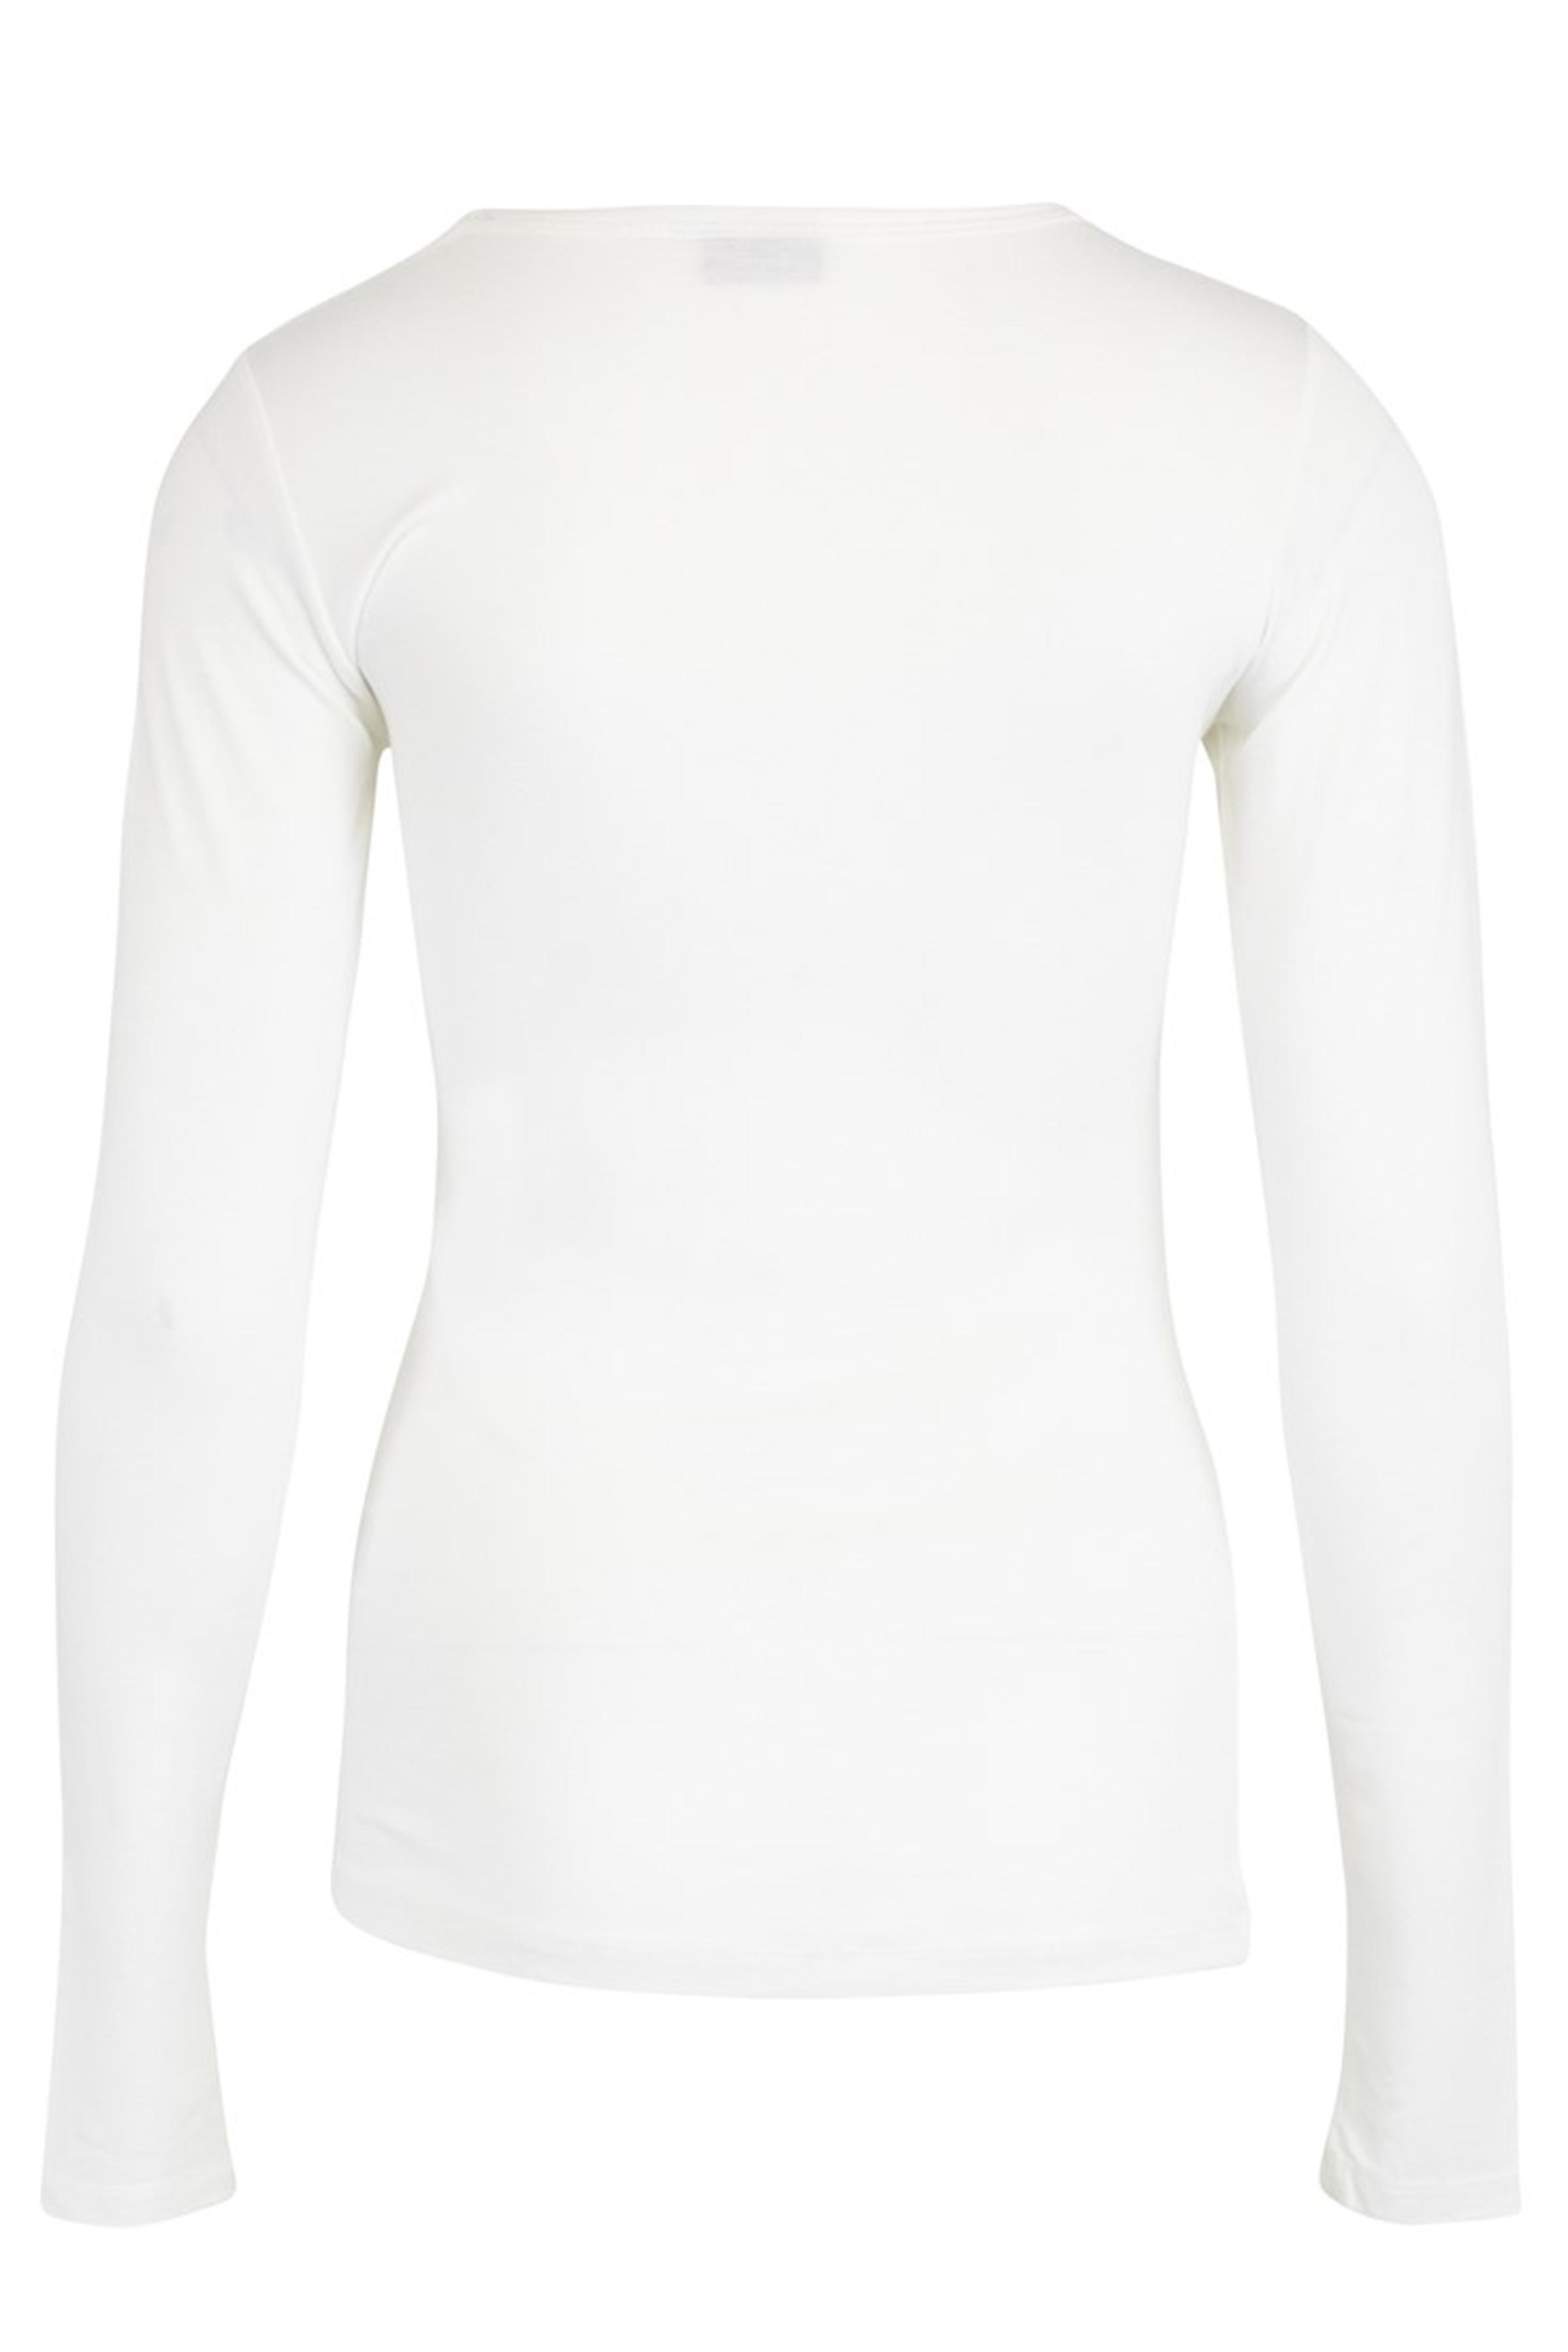 Off-white Langærmet T-shirt fra Fransa – Køb Off-white Langærmet T-shirt fra str. XS-XXL her